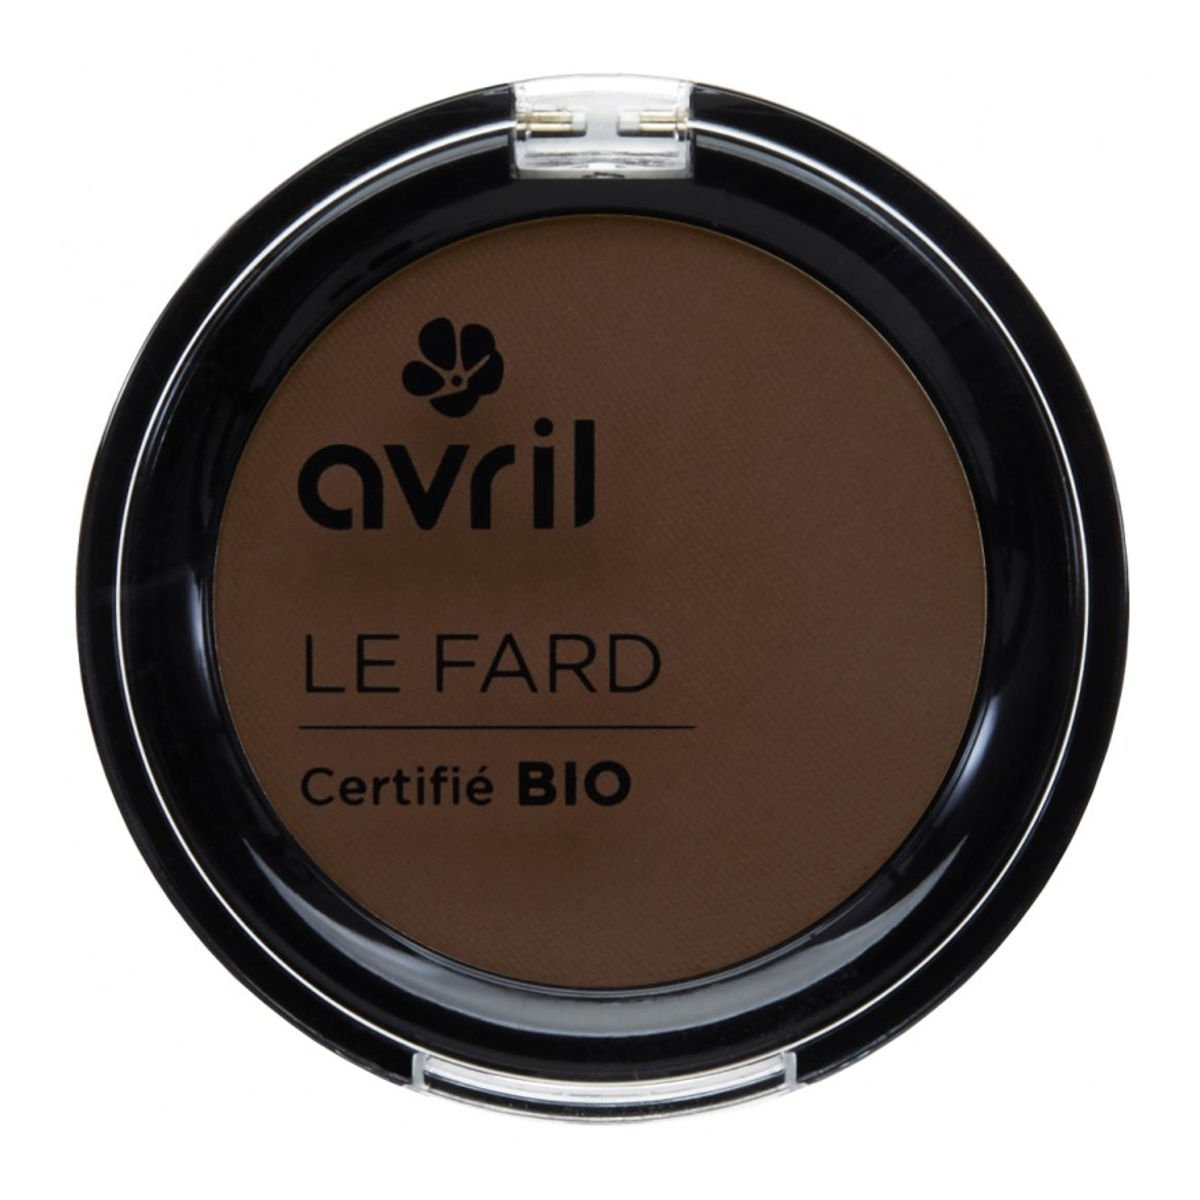 Avril Fard à Paupières Certifié Bio Prune Irisé 2, 5 g 00454